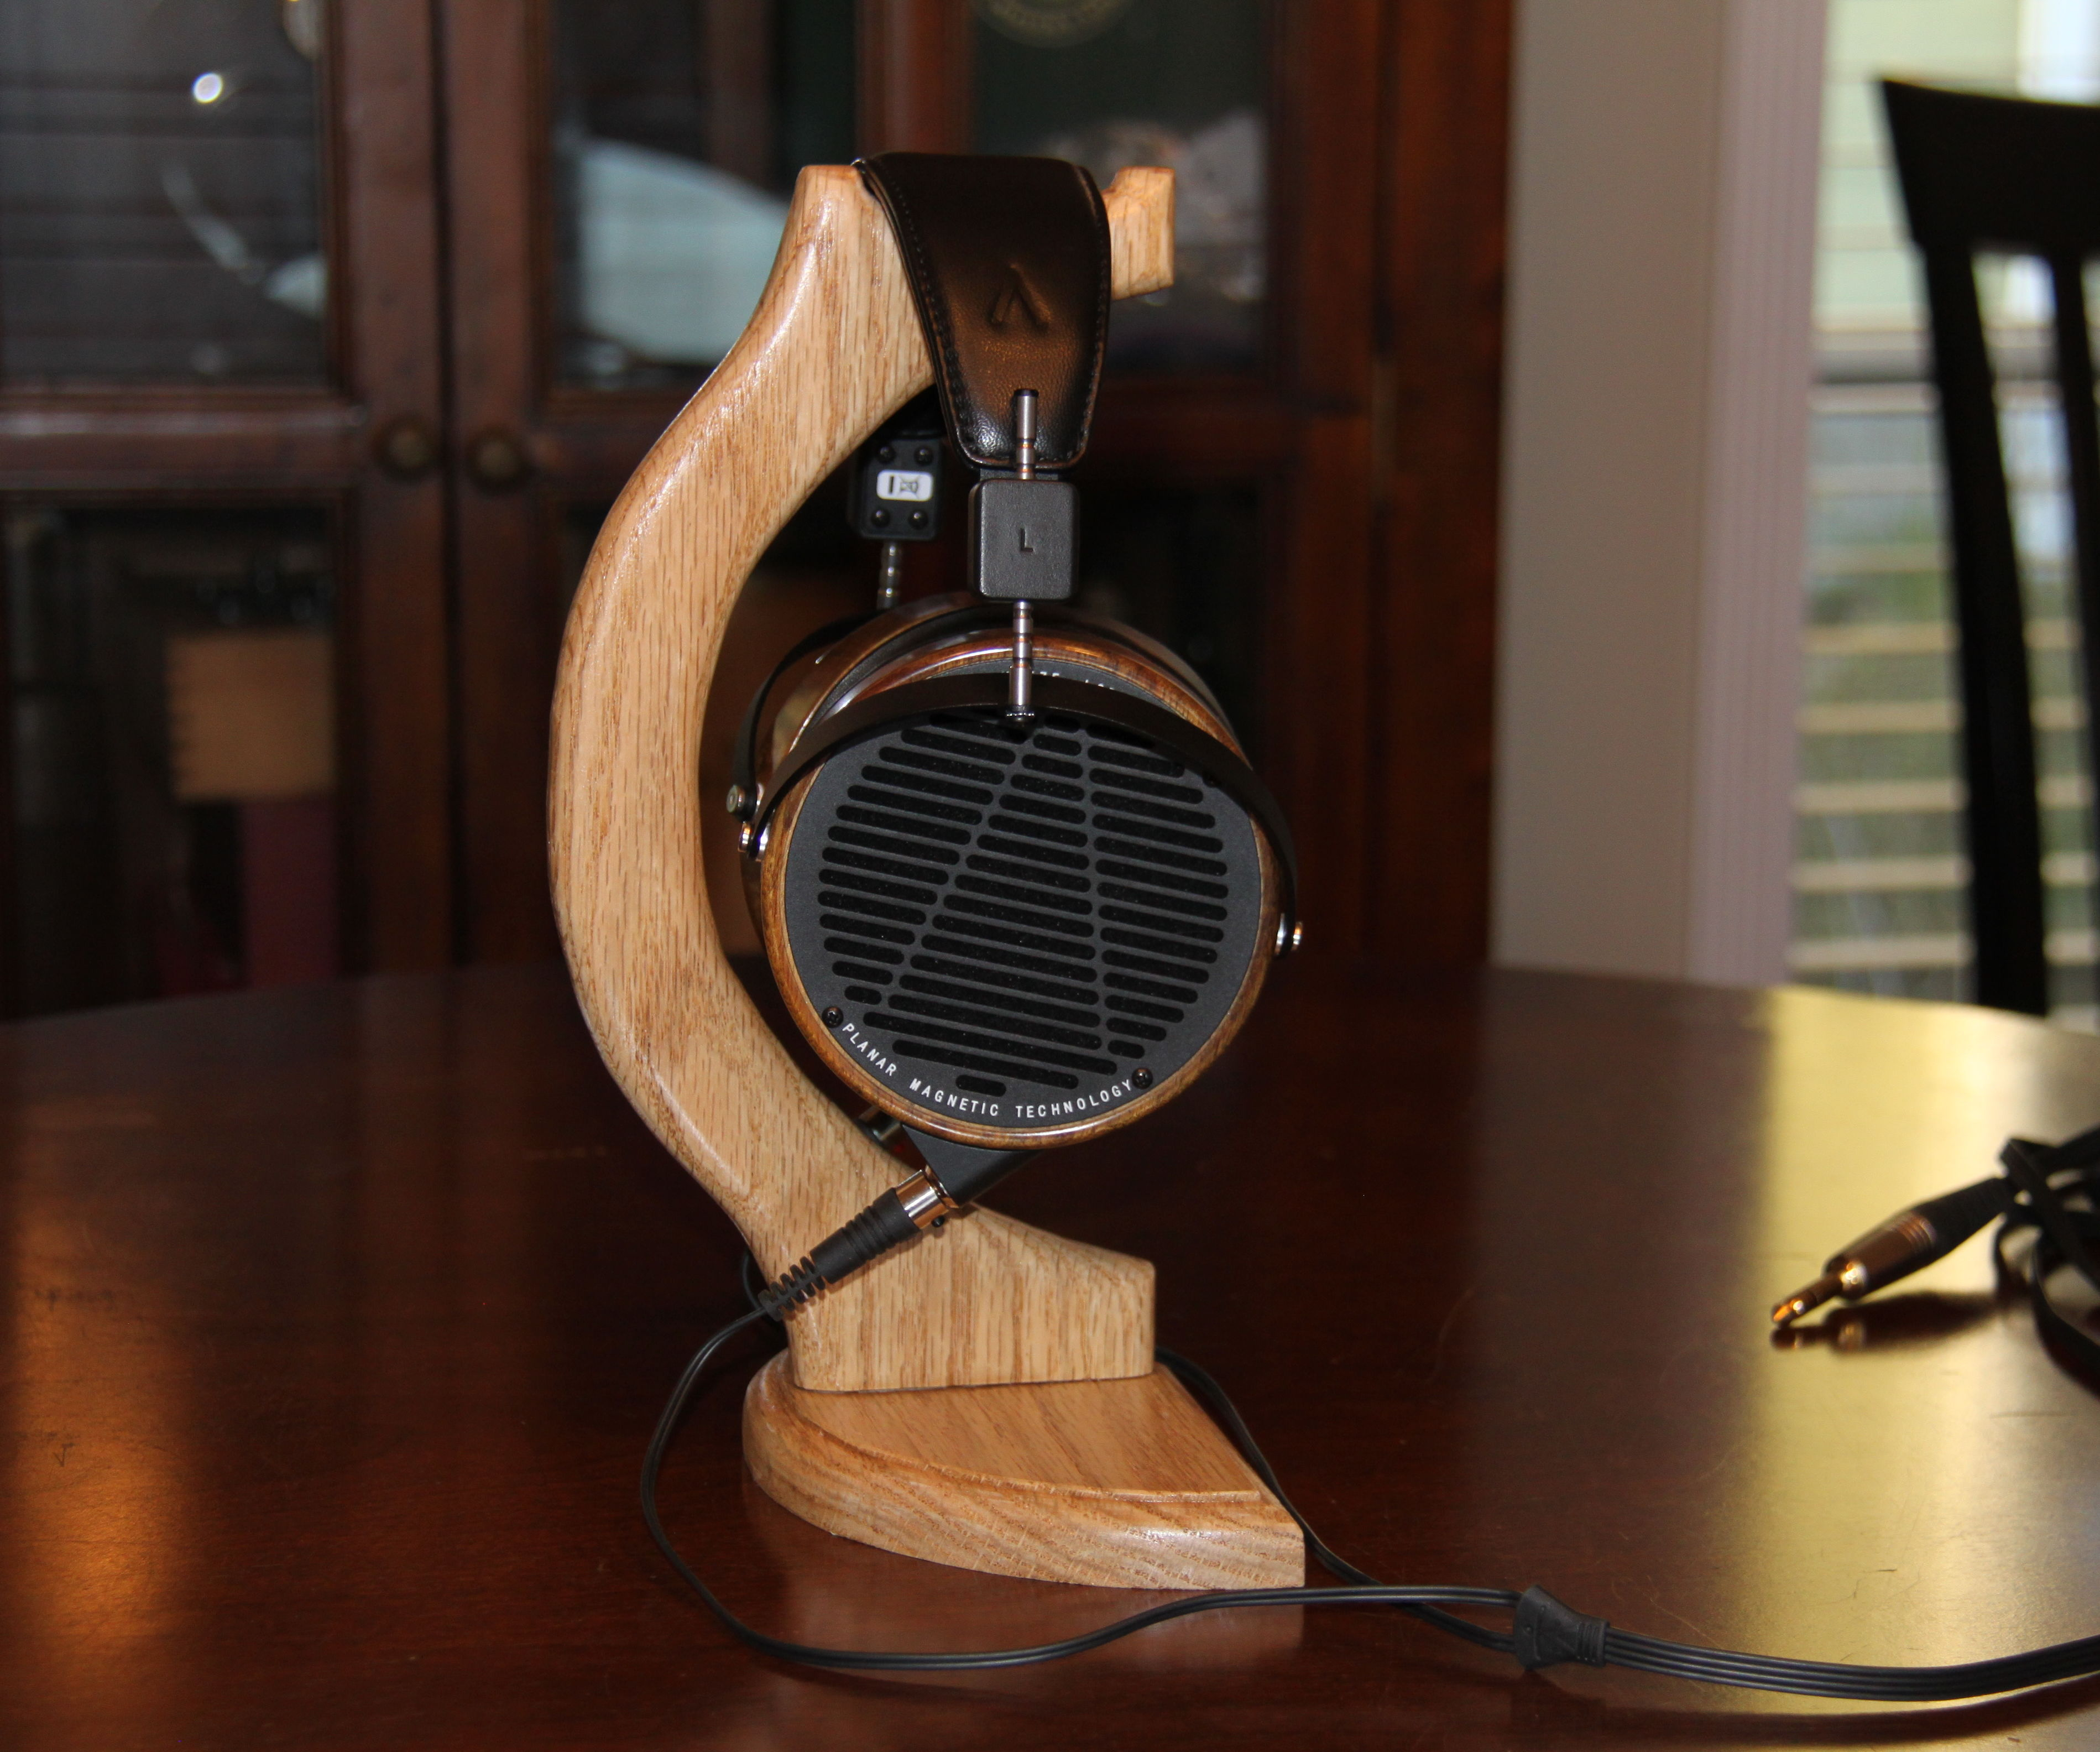 Hardwood Headphones Stand Designed for Large Headphones